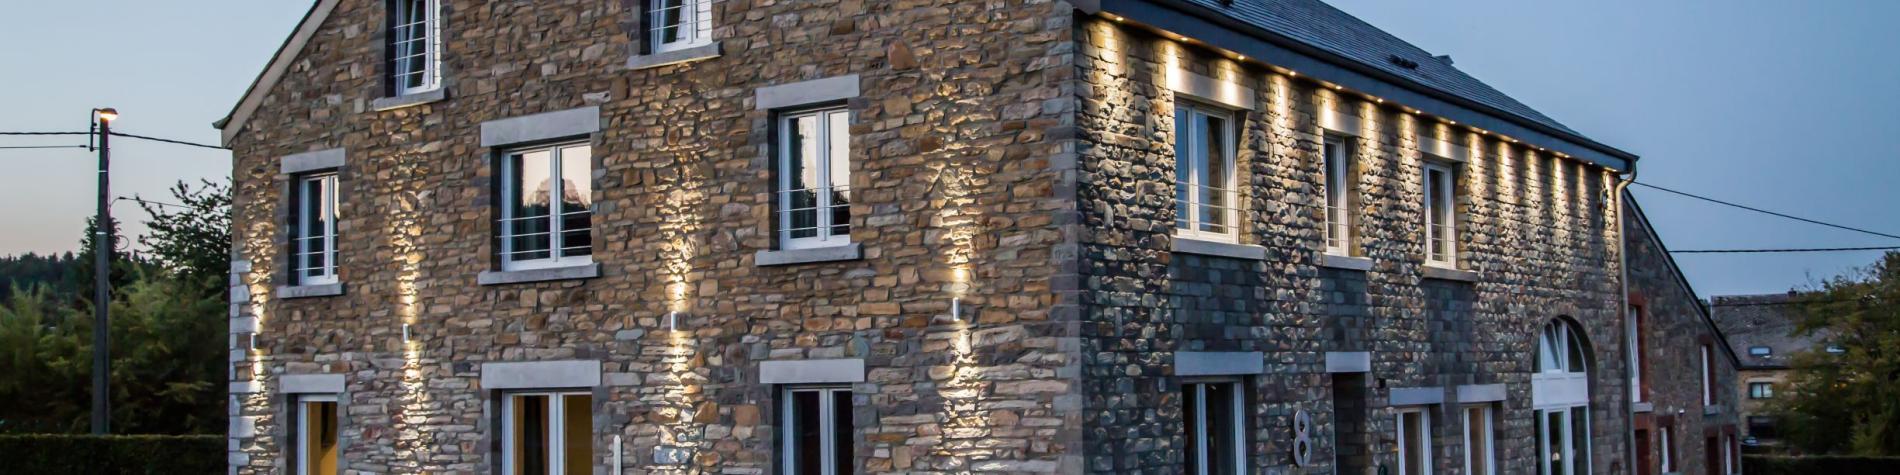 Gîte rural Chez Odon - façade